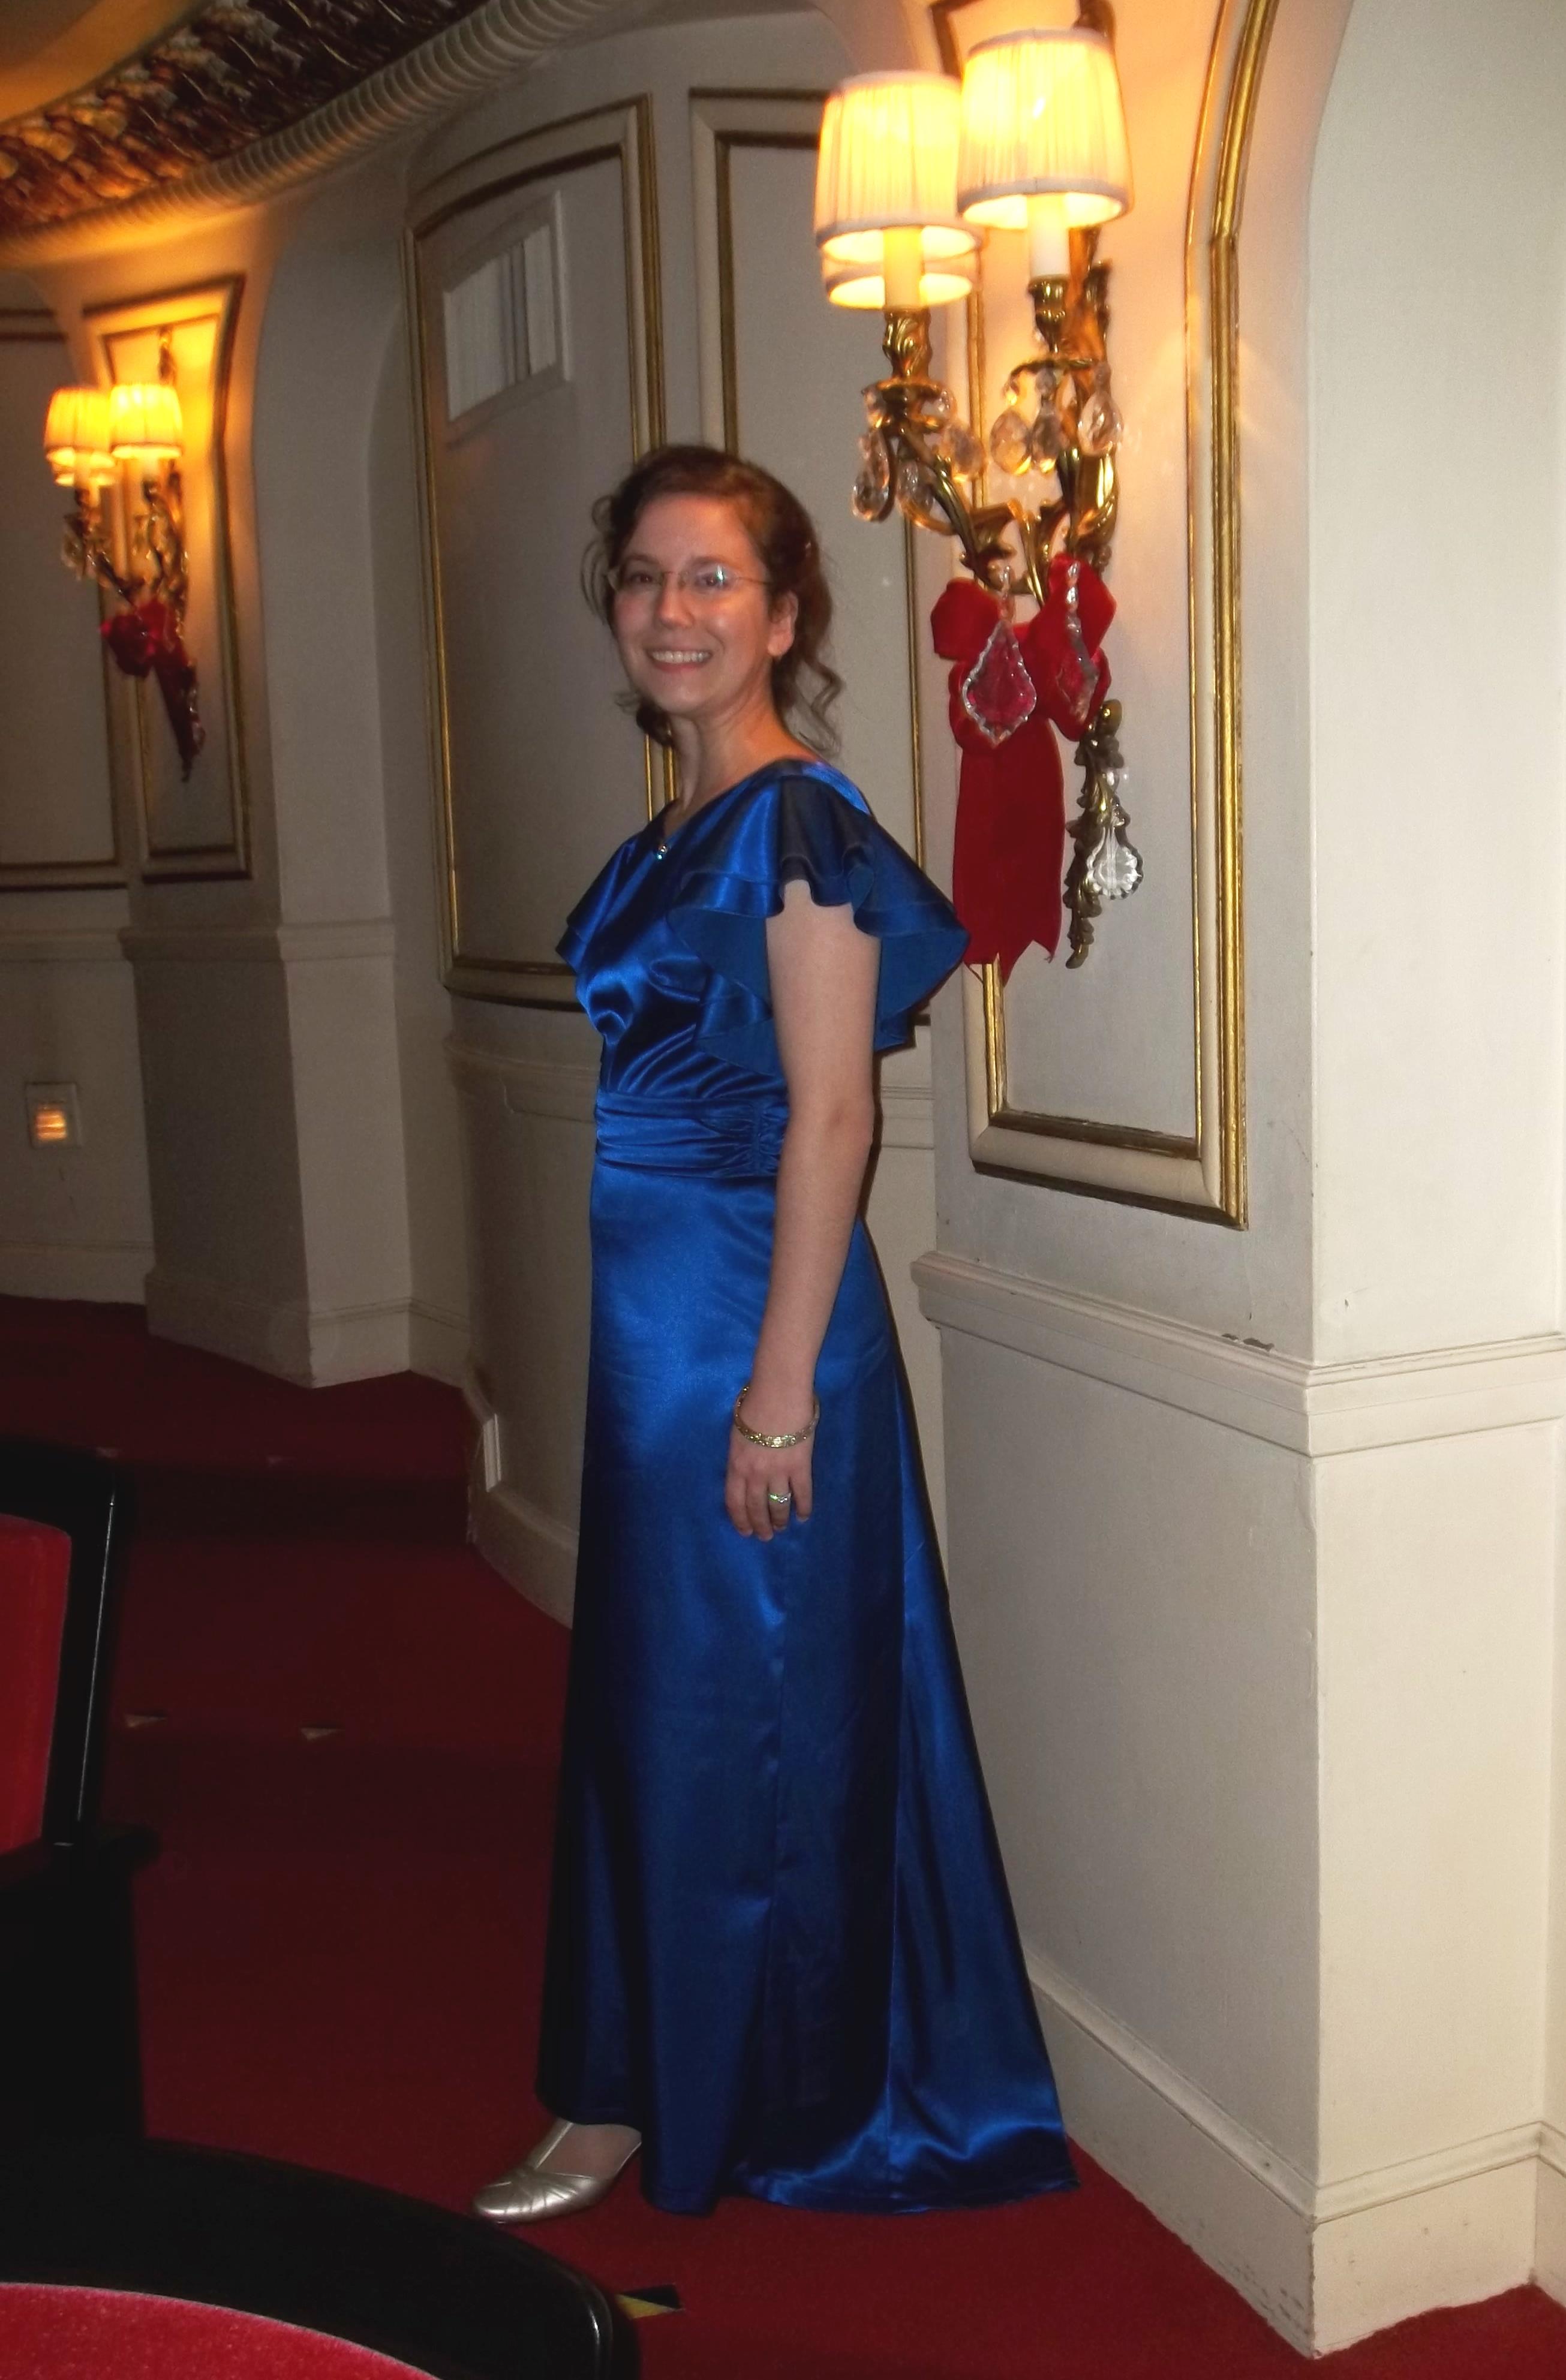 evening gown | Seam Racer